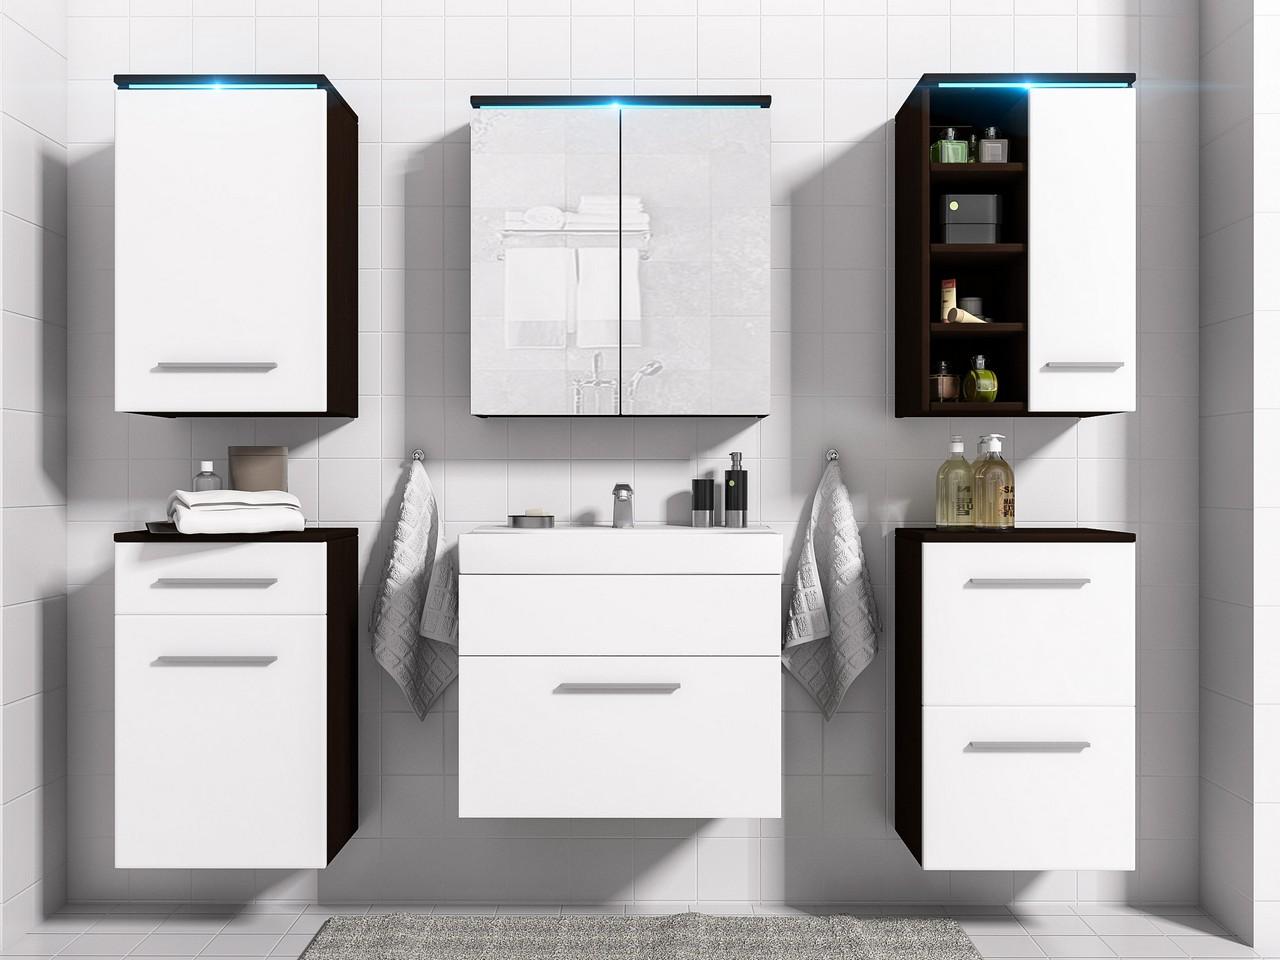 Lacná kúpeľňa MEGI 6 s LED osvetlením